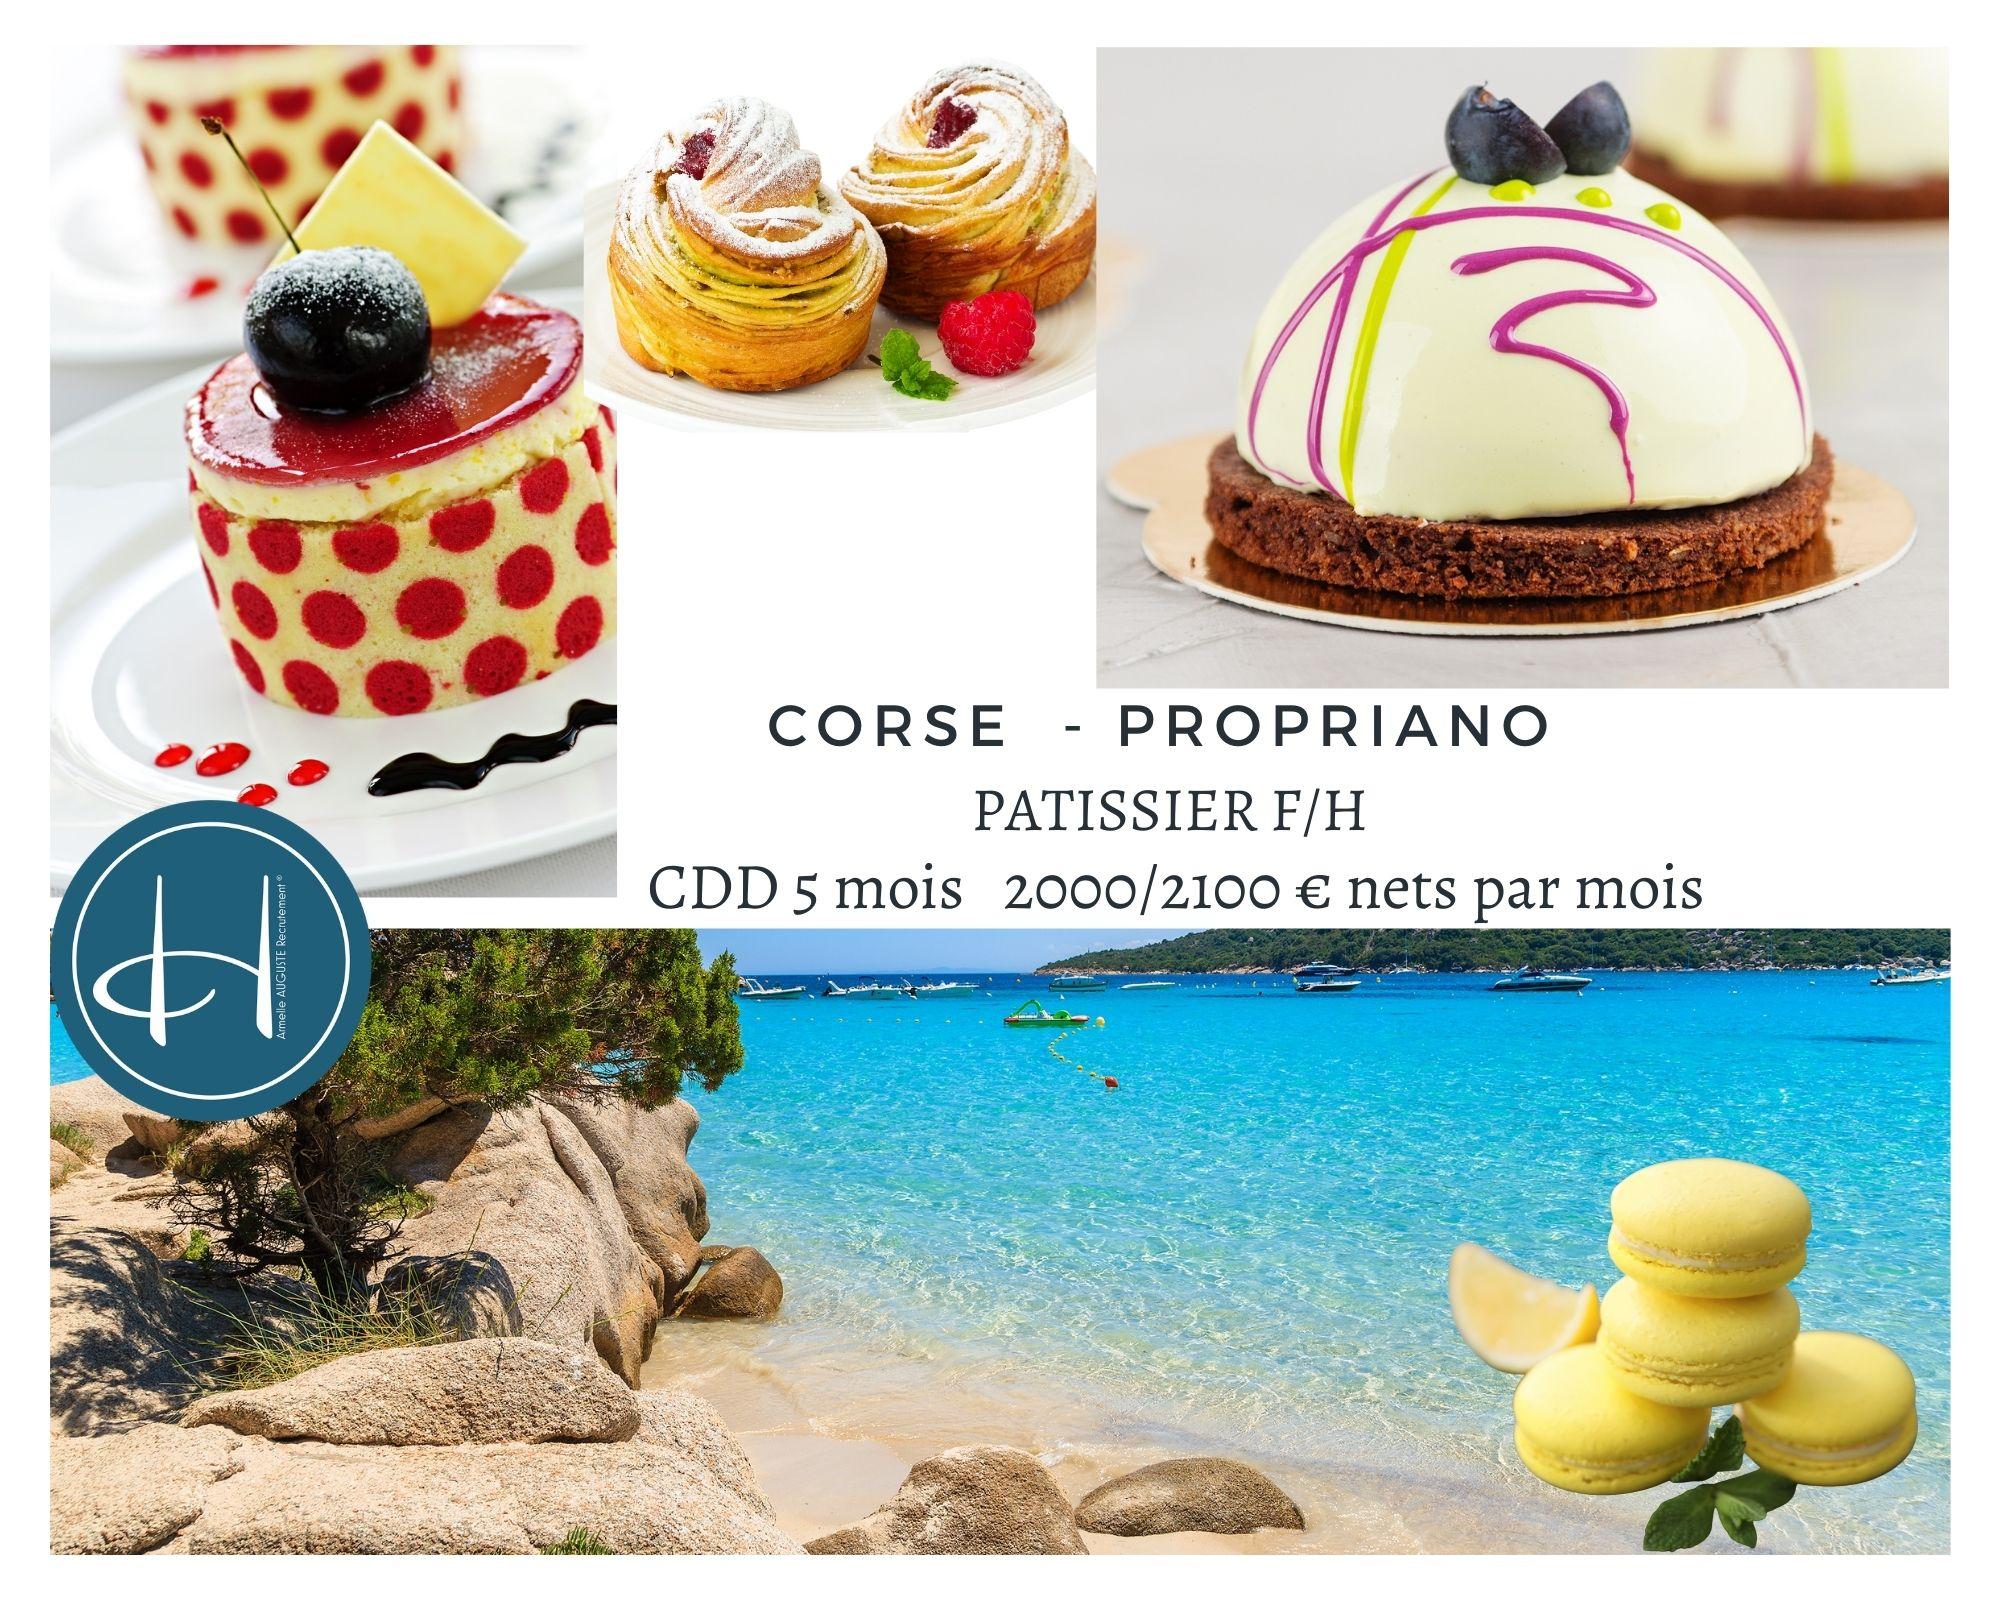 Recrutement: Pâtissier F/H chez Armelle AUGUSTE Recrutement® à Propriano